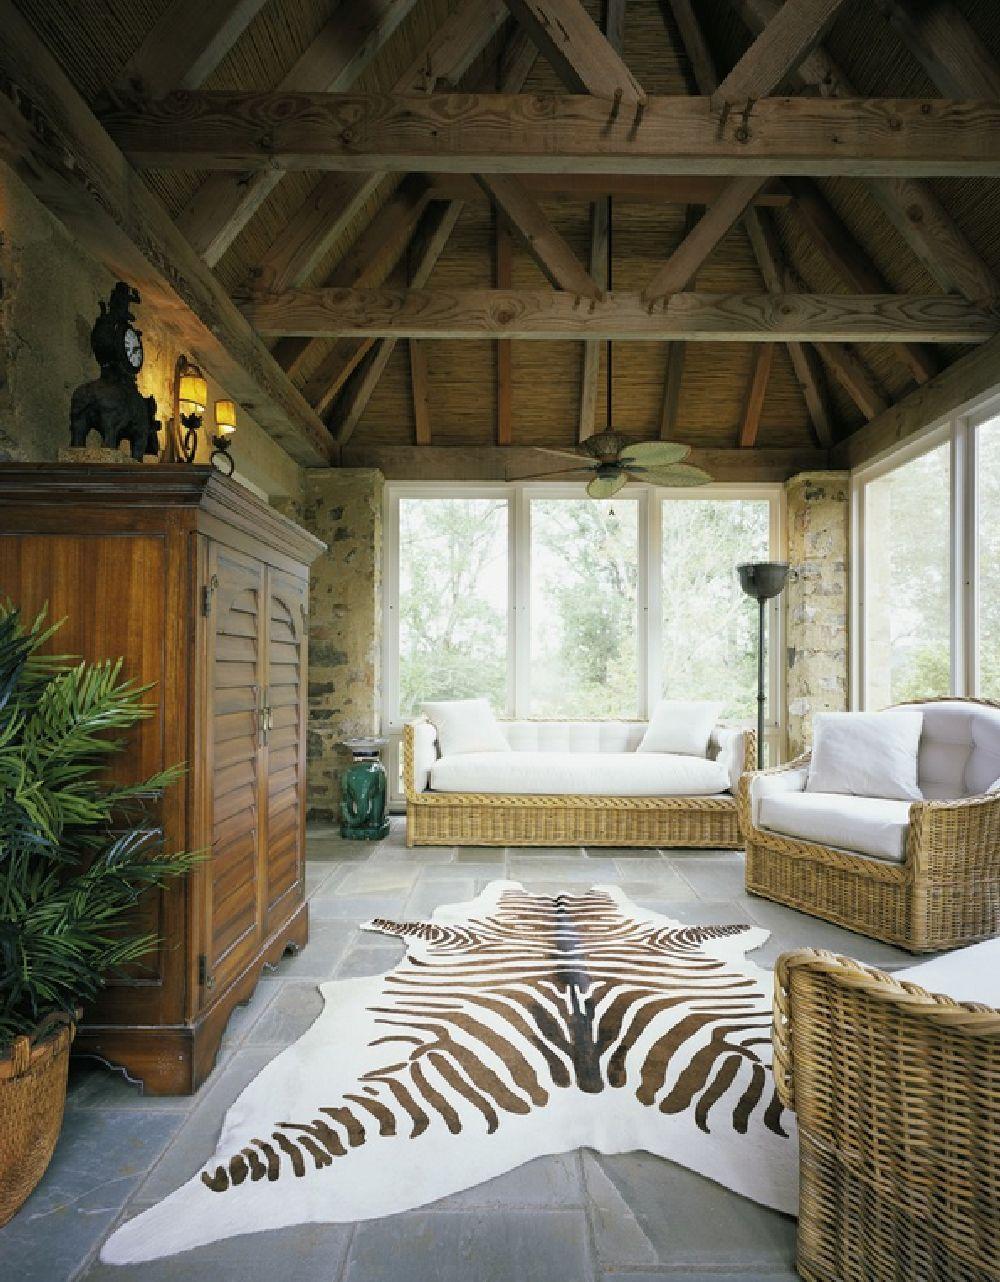 adelaparvu.com despre casa in stil provence, arh Mark Buchanan, design interior Sgoshana Datlow, Foto Ron Blunt (19)